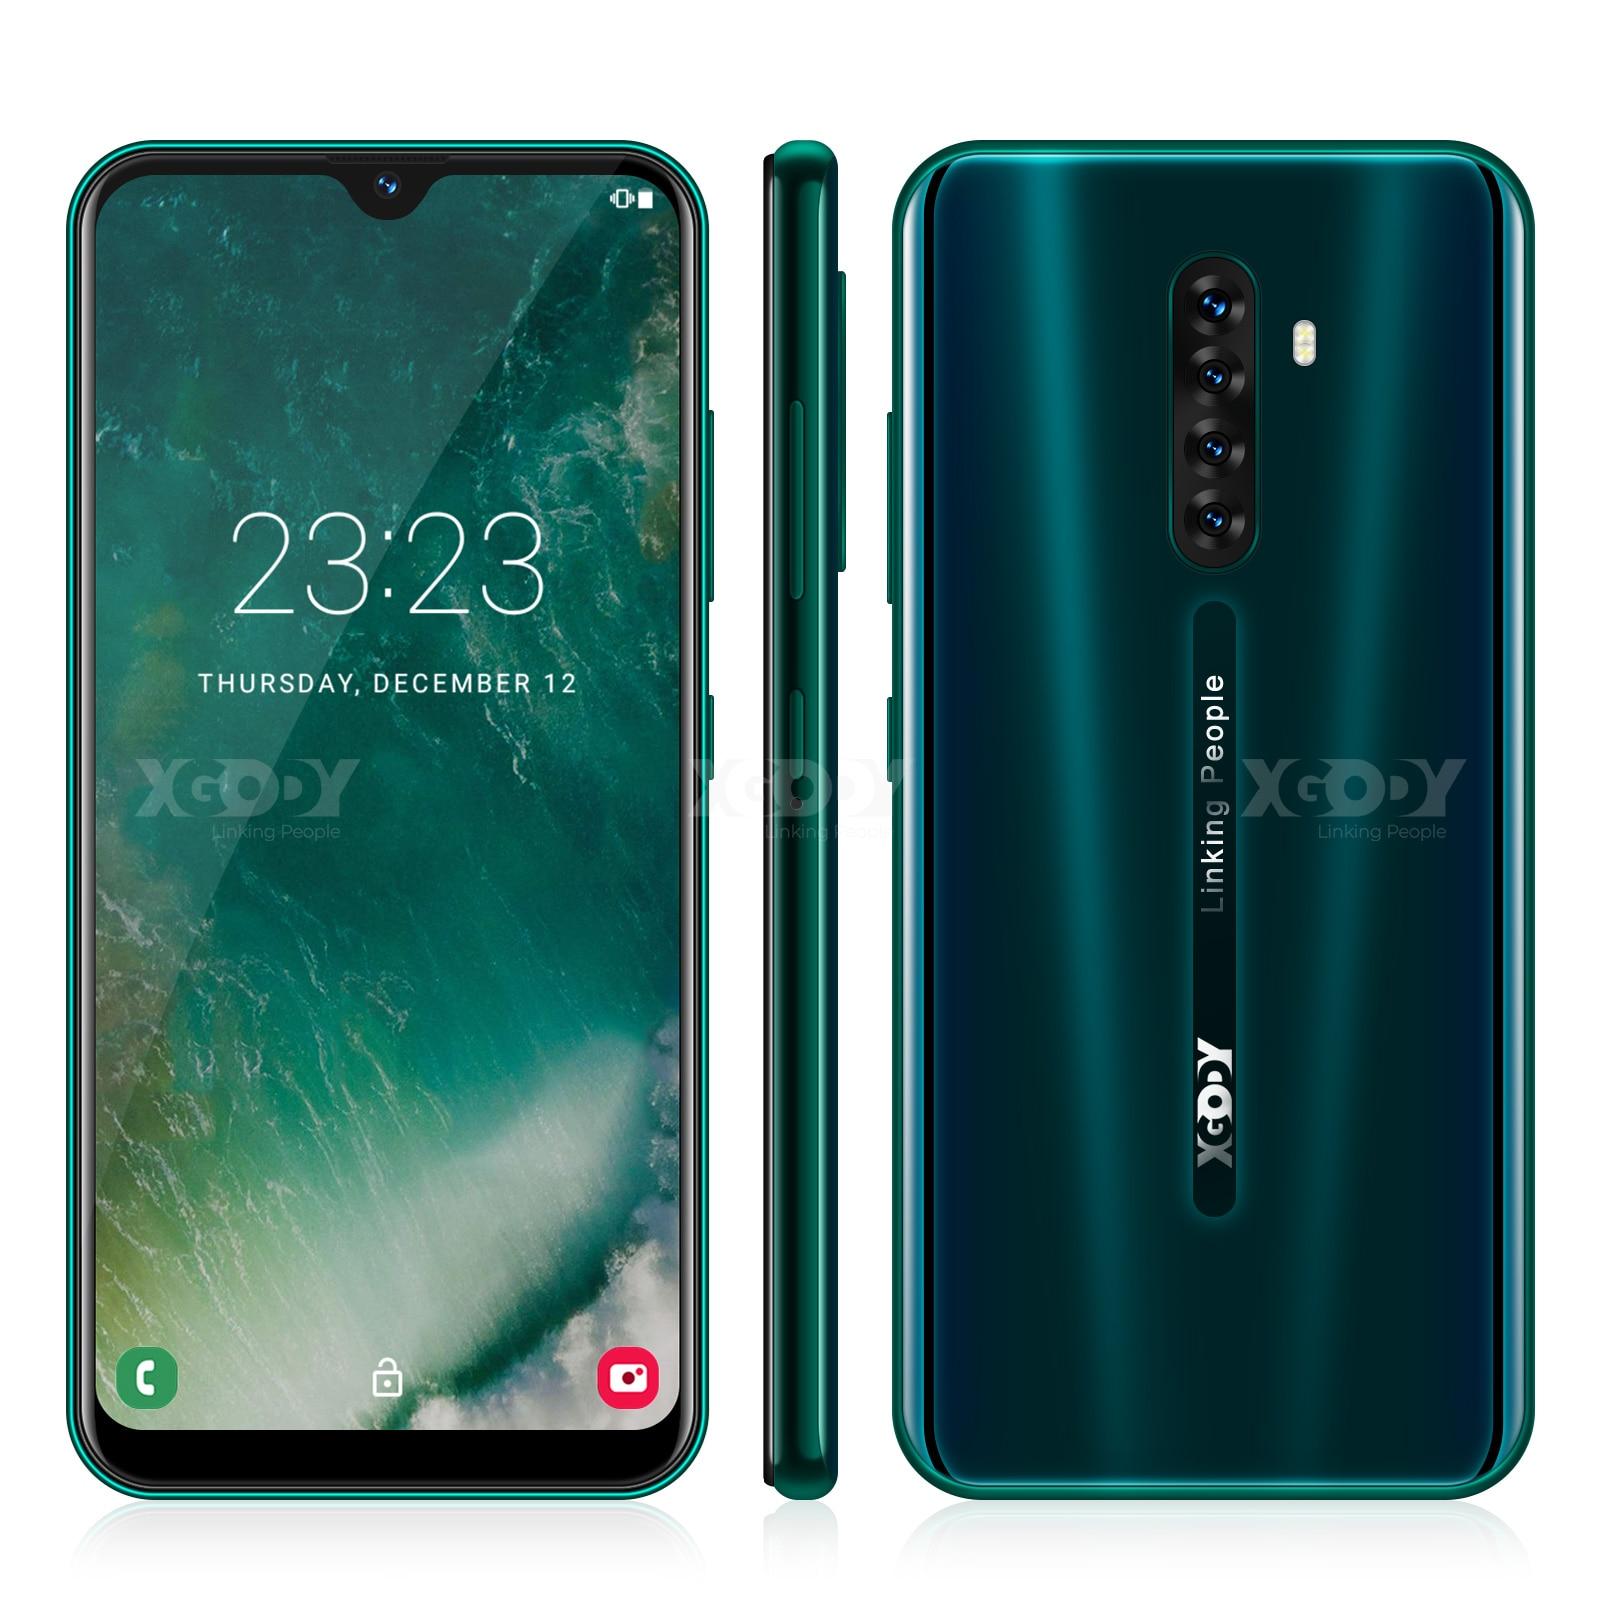 XGODY note 8 4G Smartphone 6.3 Android 9.0 19:9 Cellphone 2GB RAM 16GB ROM 2850mAh Quad Core Dual SIM GPS Wi-Fi Mobile Phone